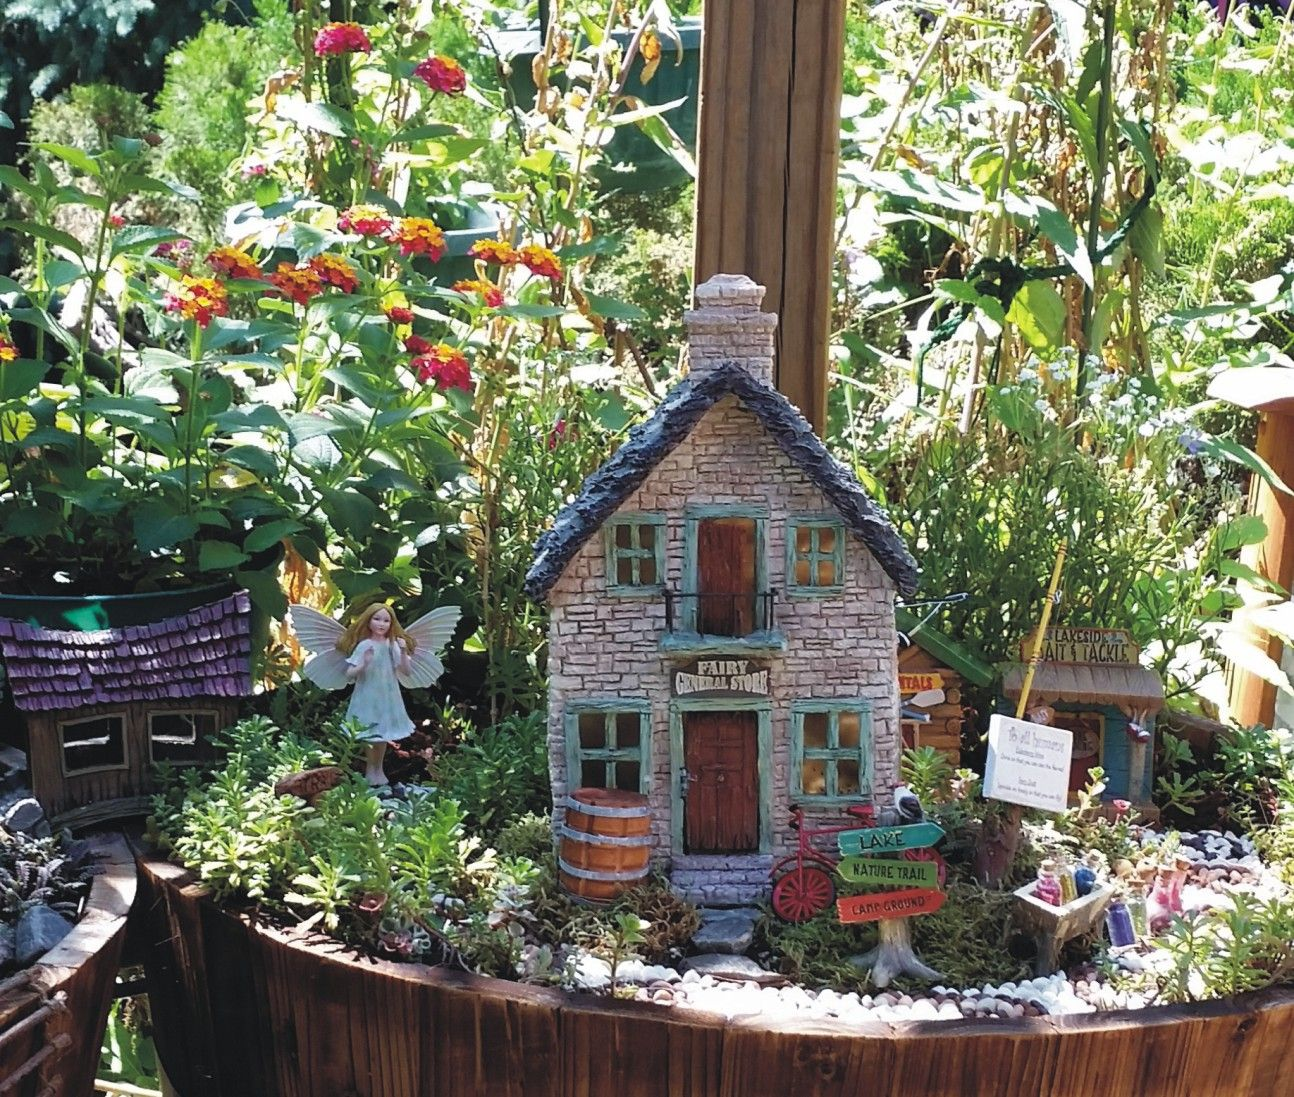 Miniature Fairy Garden    I like the green trim on the stone house ...